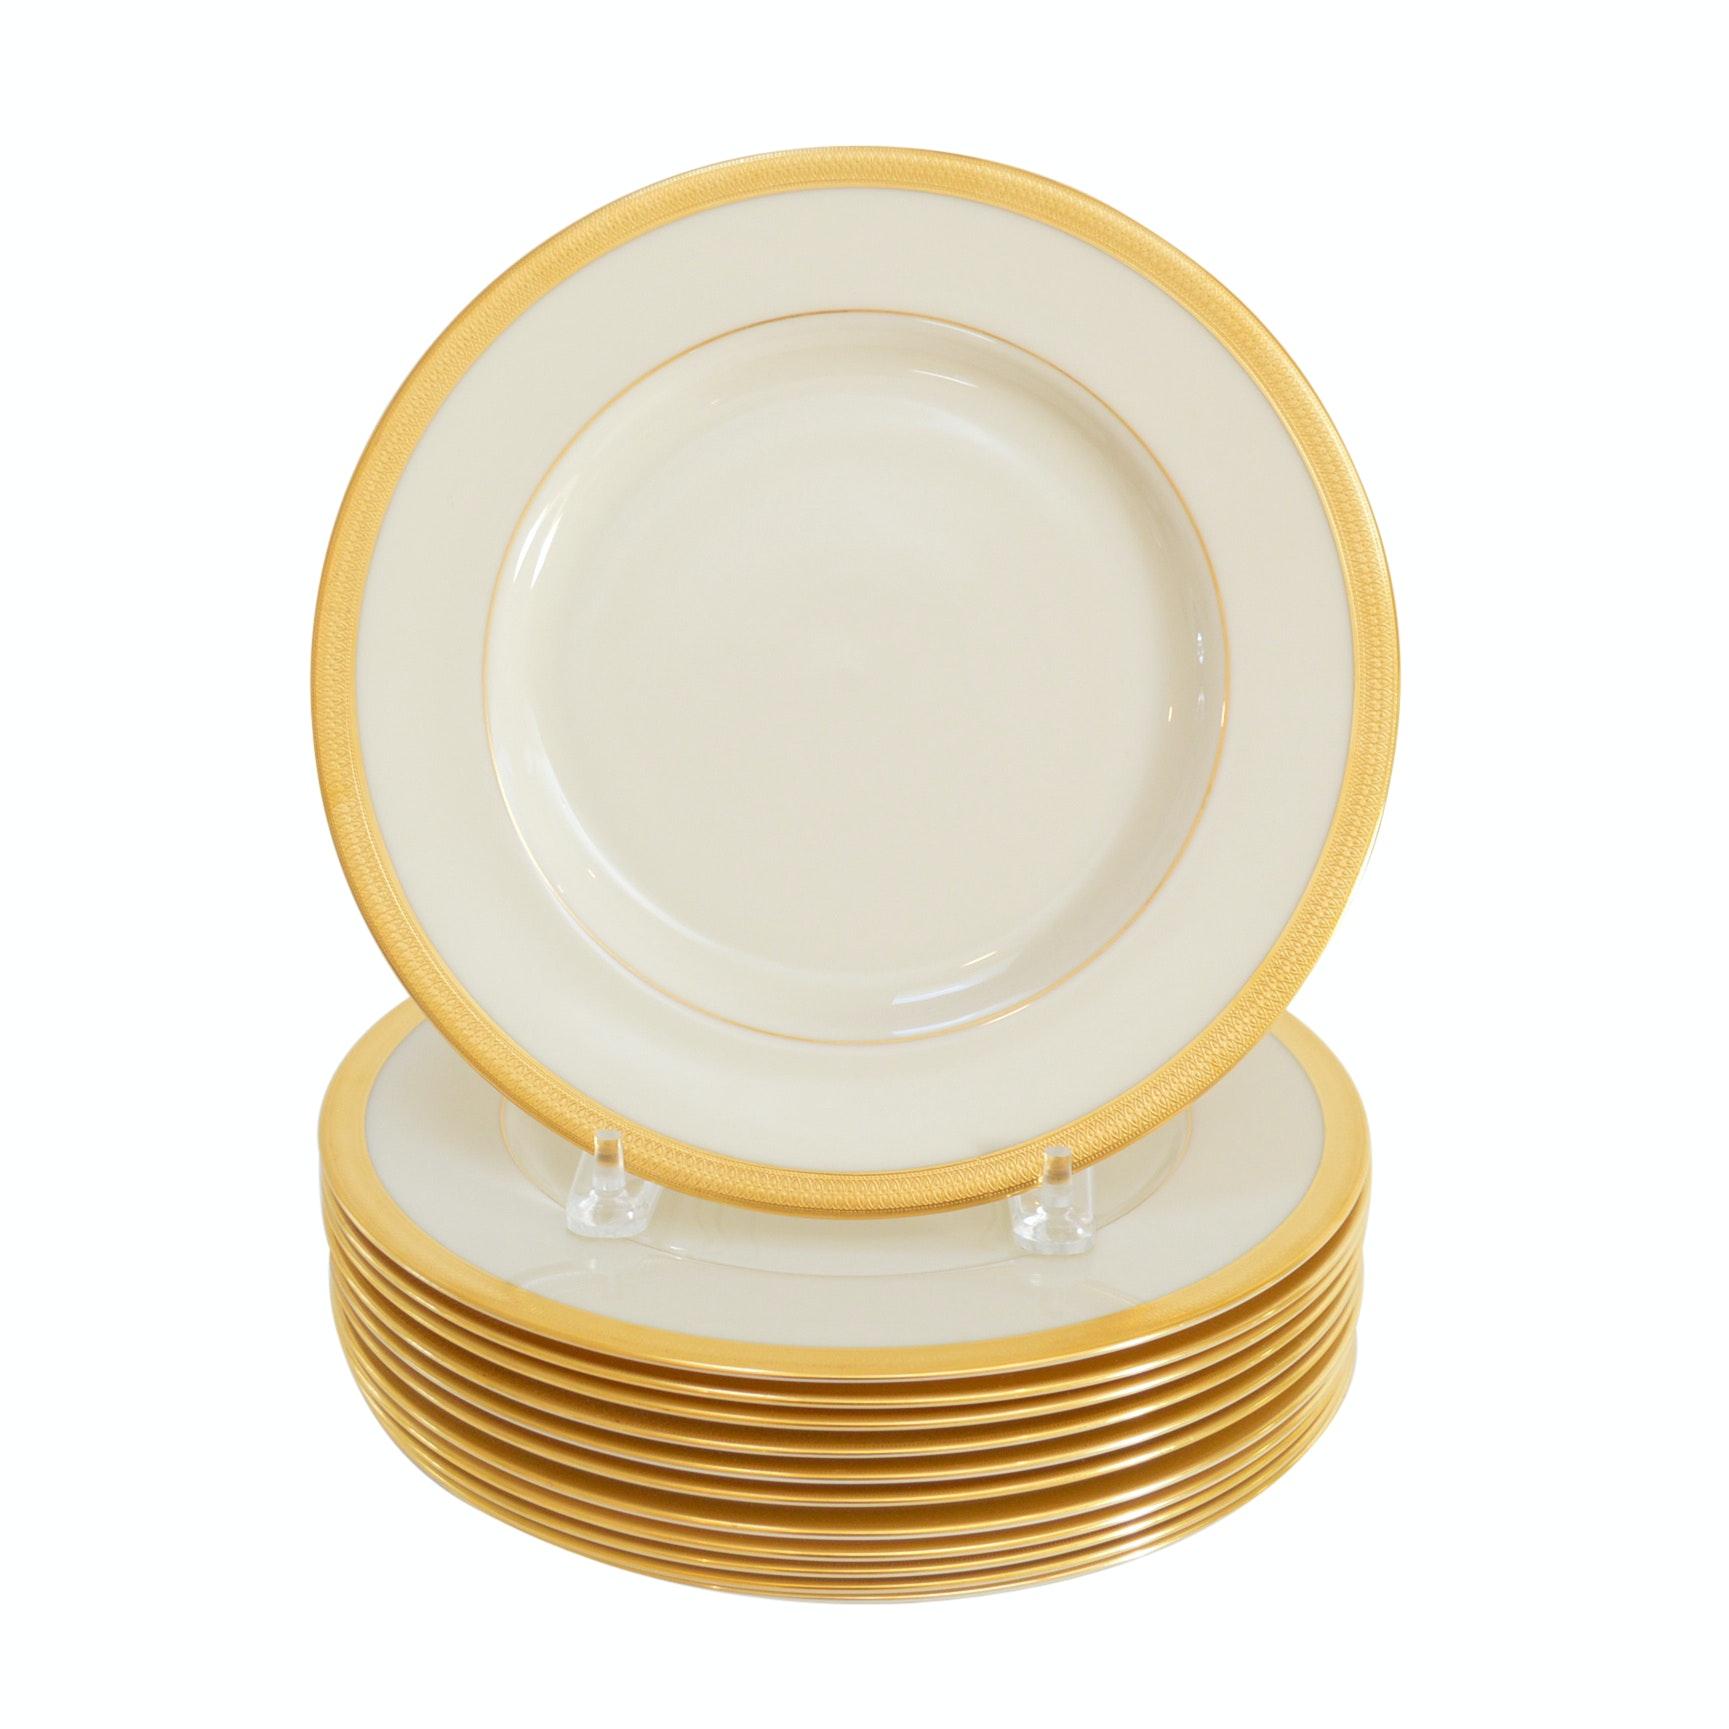 "Set of Lenox ""Lowell"" Bone China Dinner Plates"